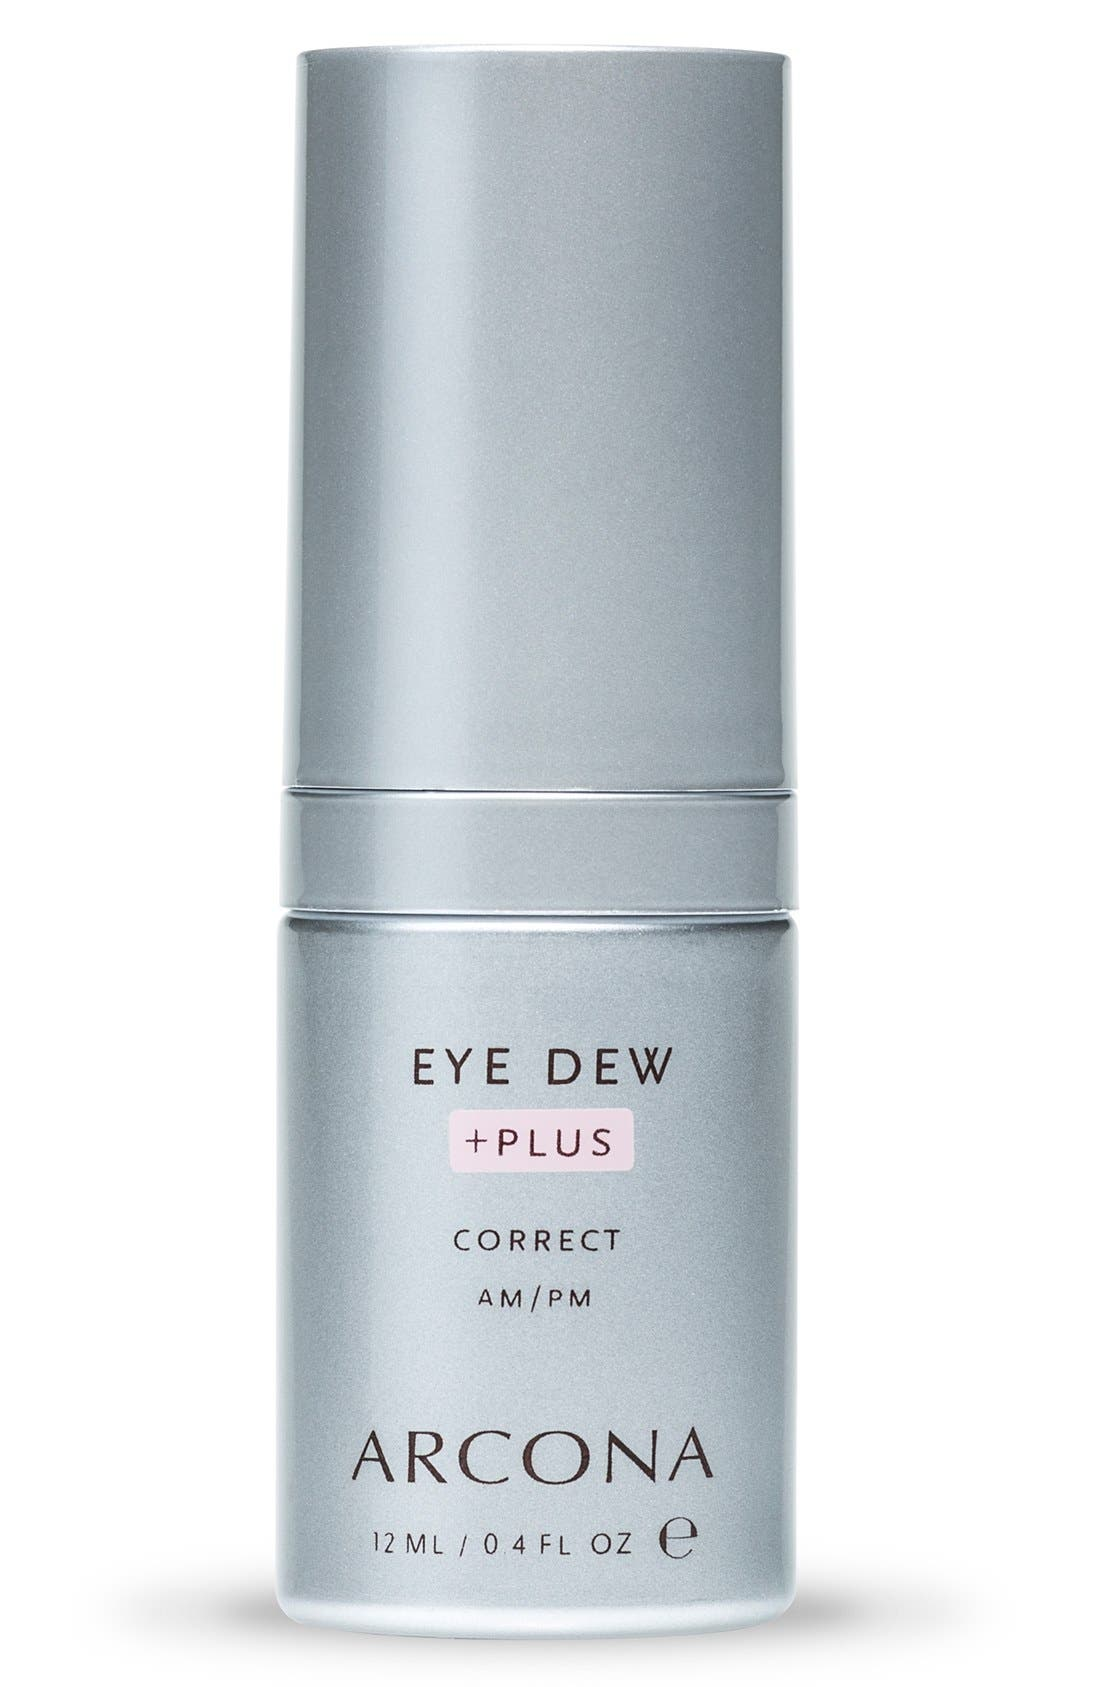 Eye Dew Plus Corrective Eye Serum